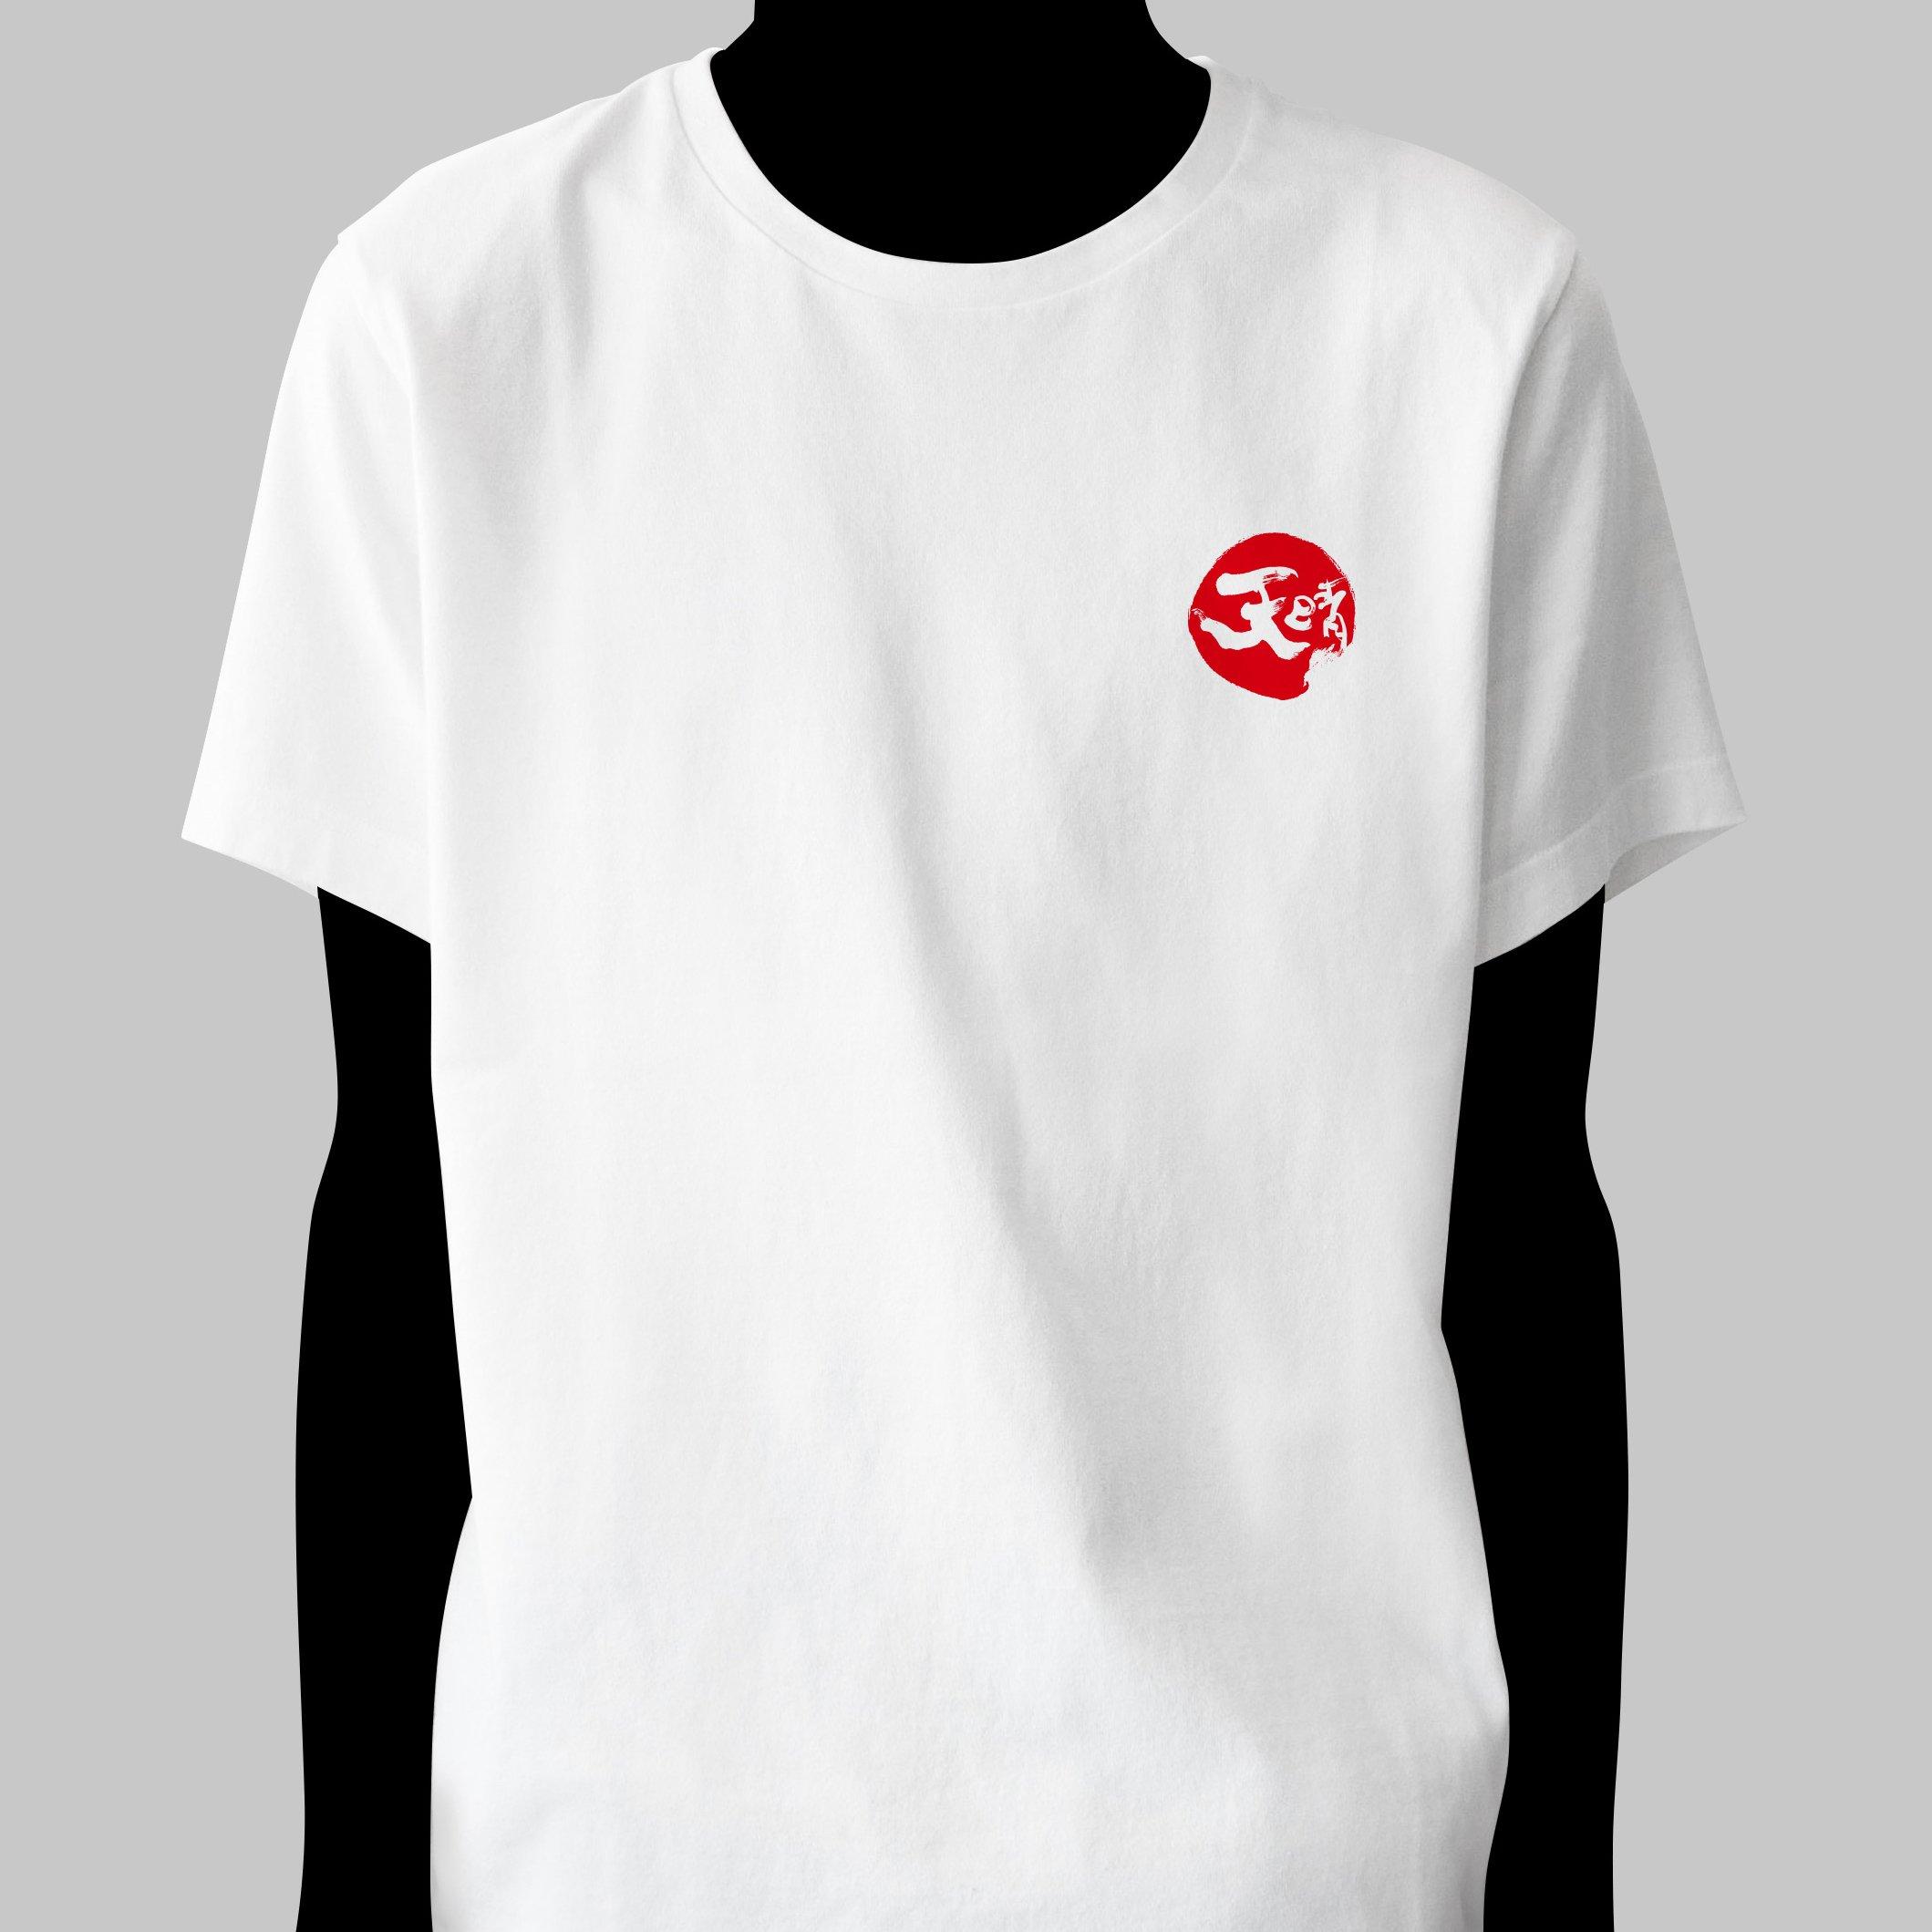 Tシャツ_場面写_front